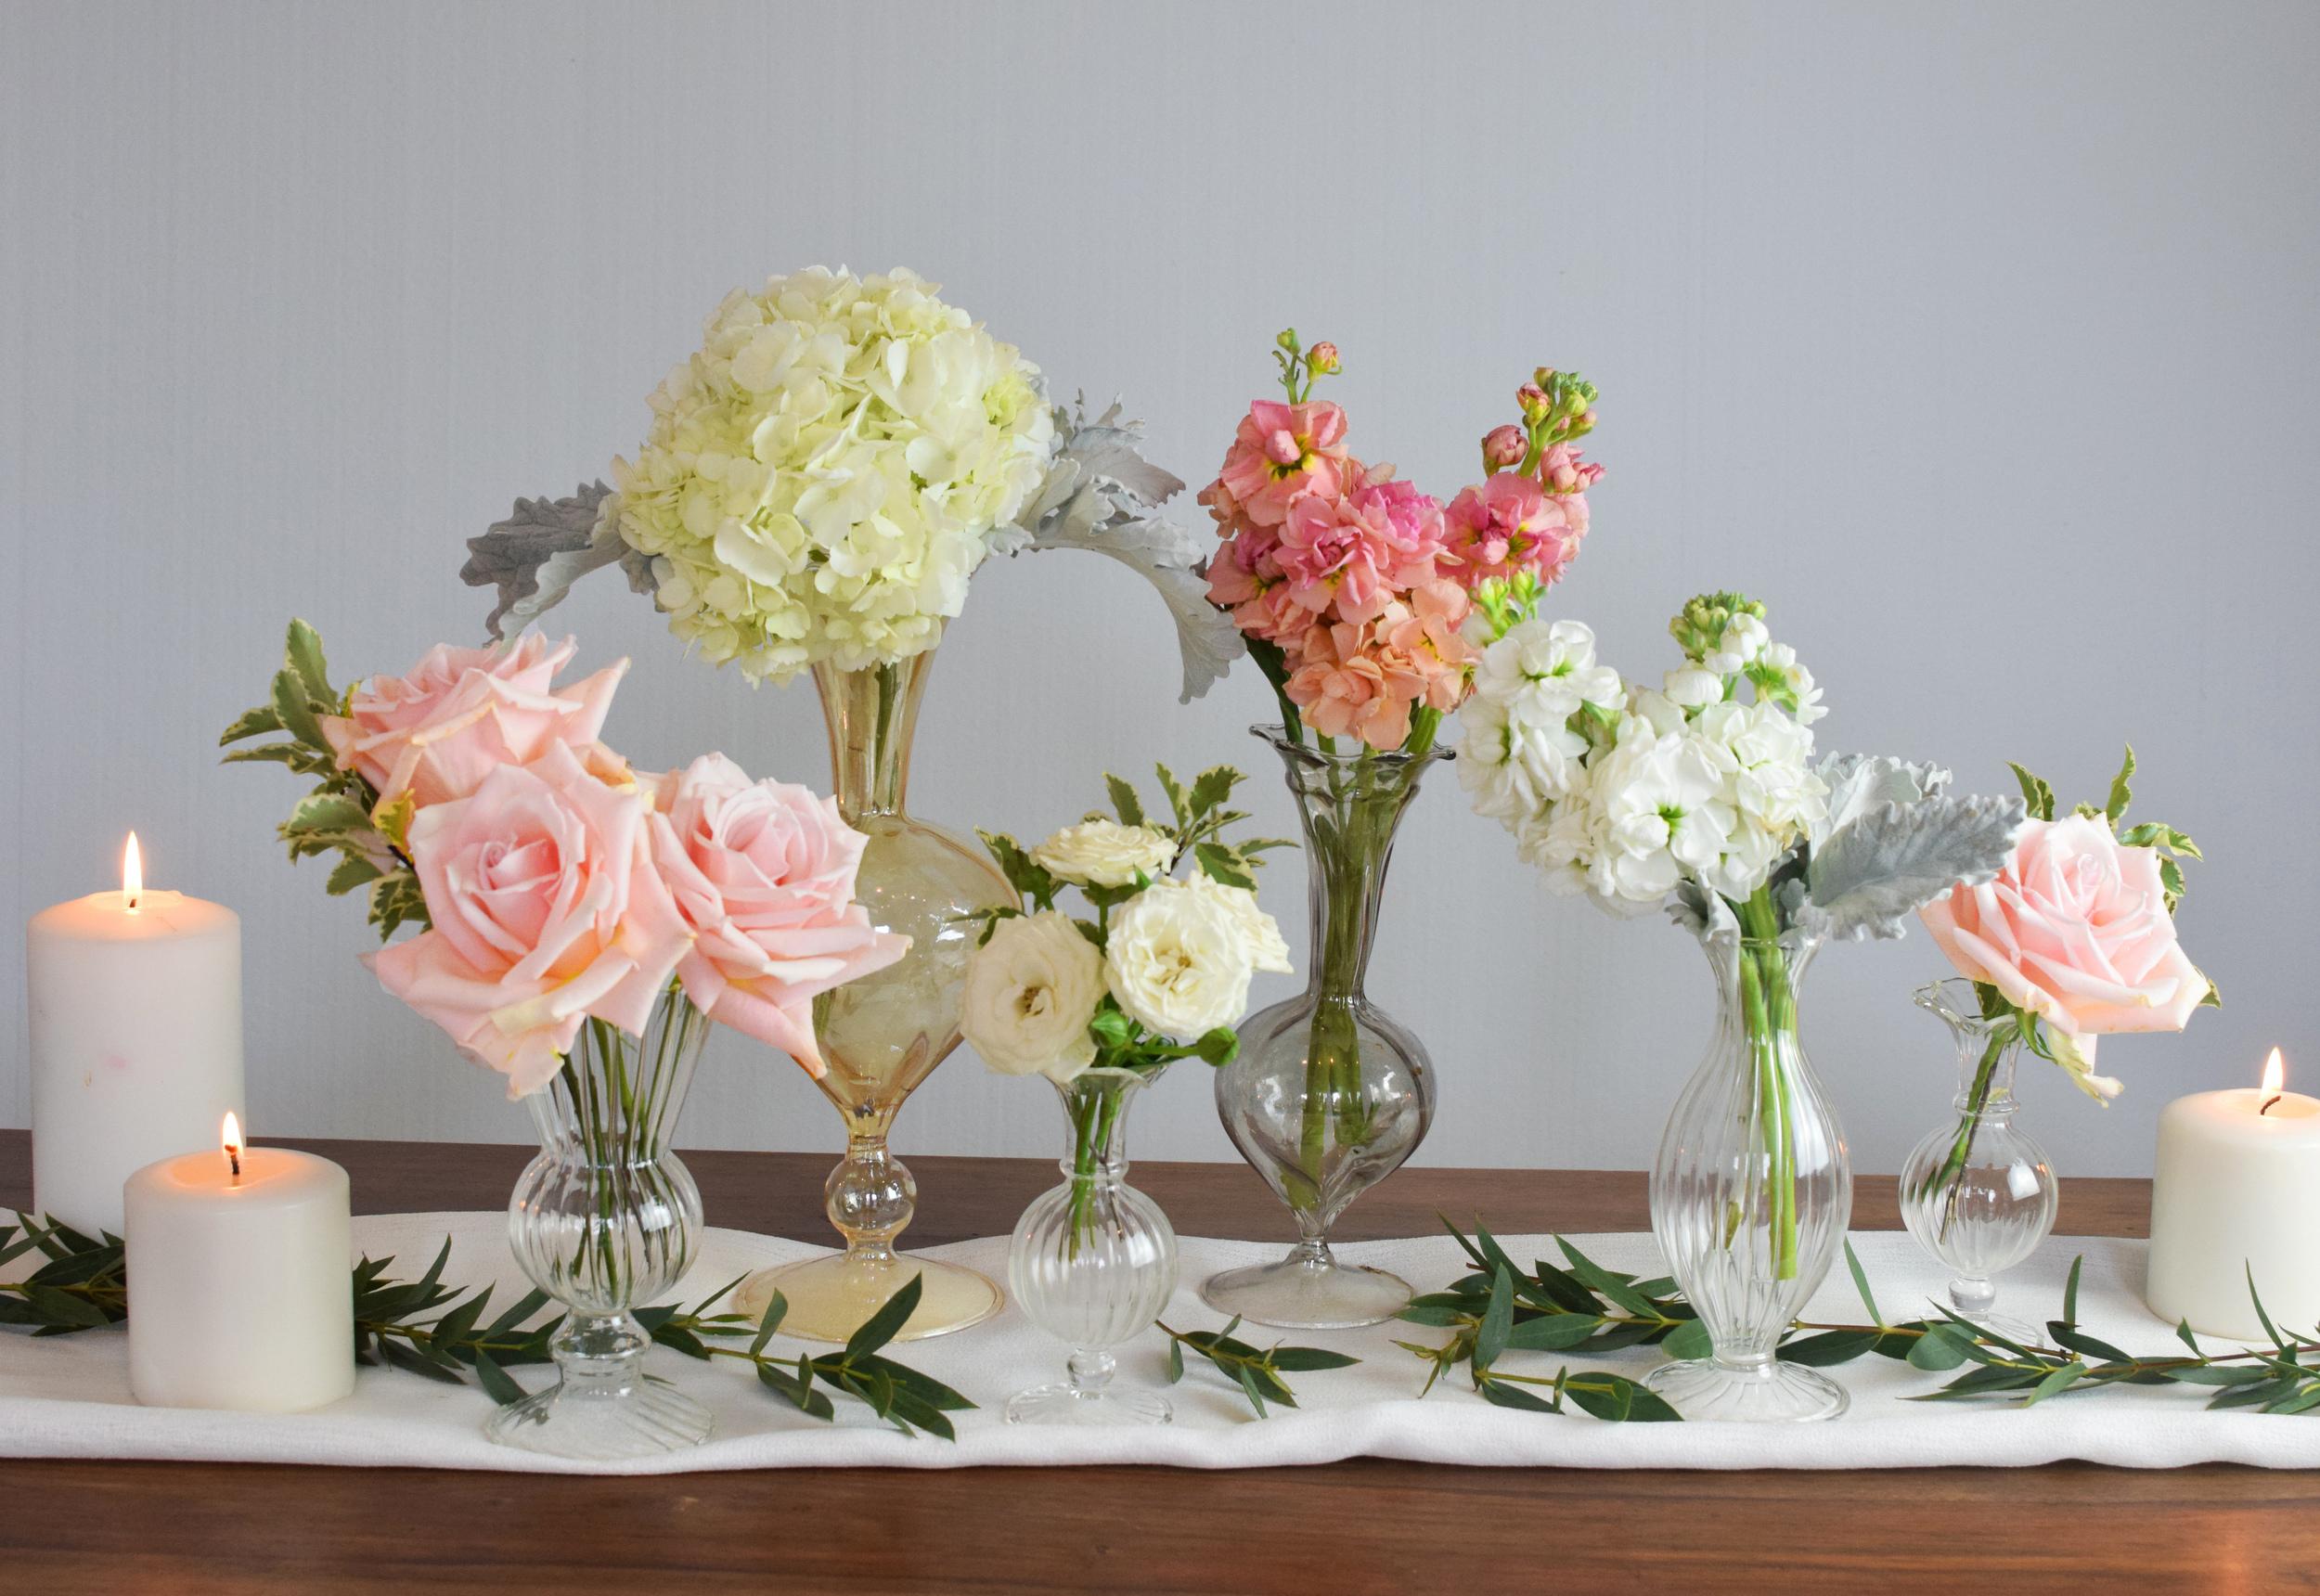 FlowerMoxiediybride_pink10.jpg